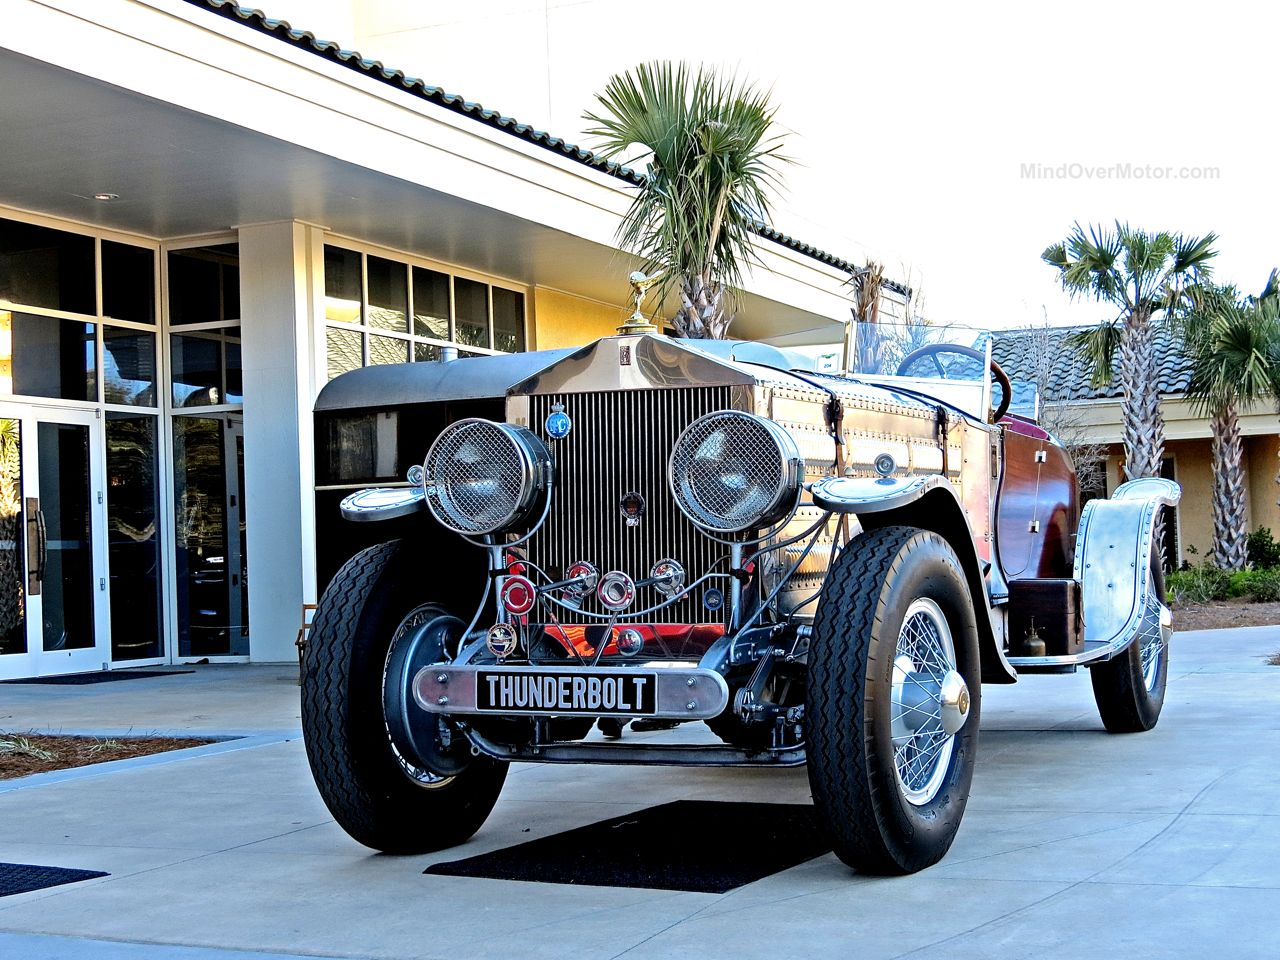 Rolls Royce Thunderbolt V12 Custom Amelia Island 1